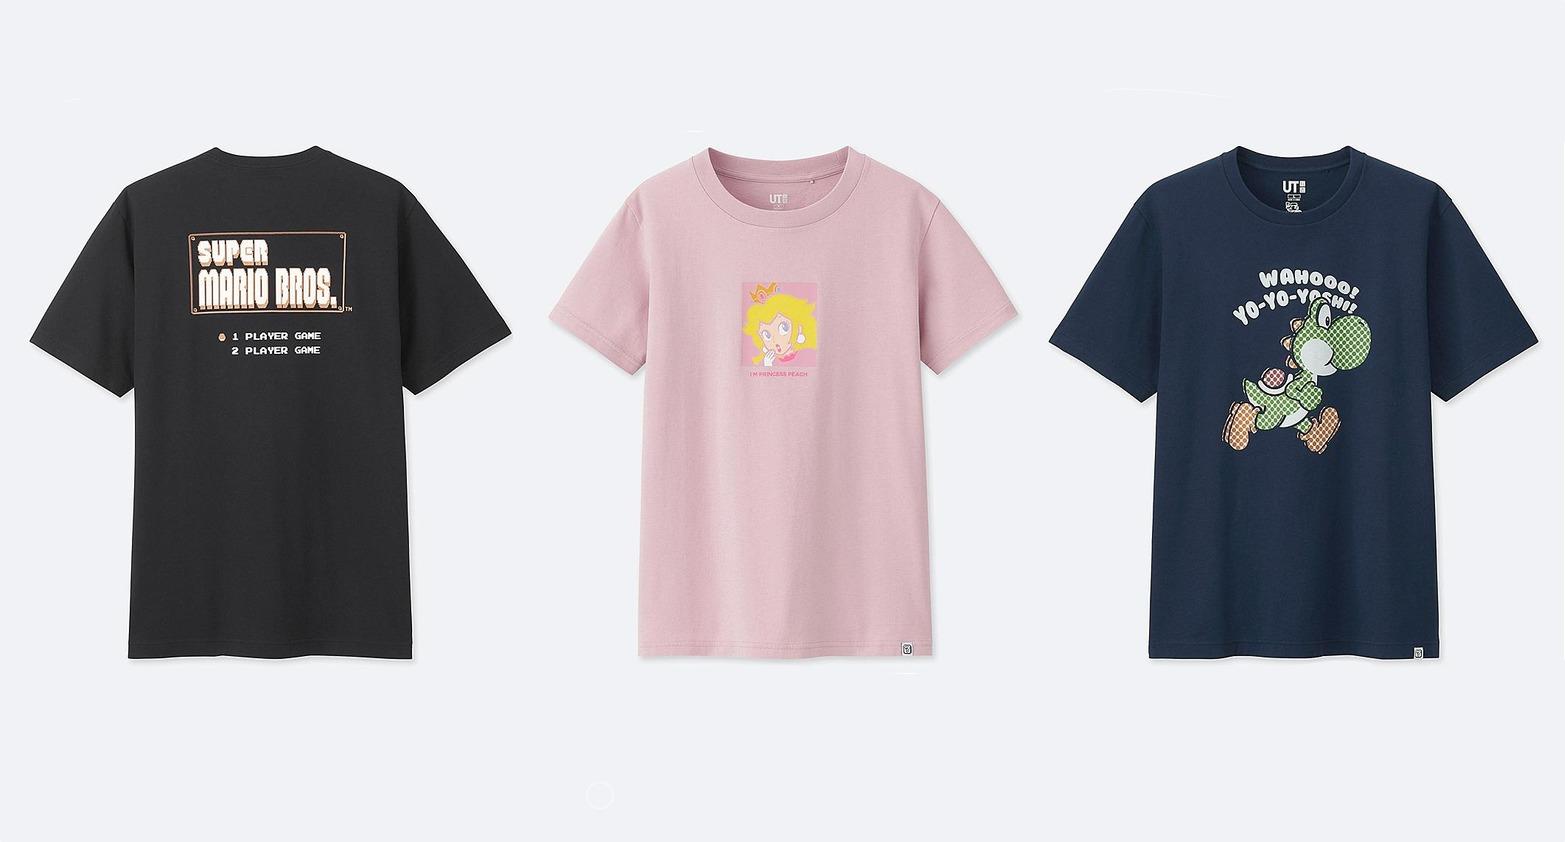 Super Mario Bros. erhält T-Shirt Kollektion bei Uniqlo